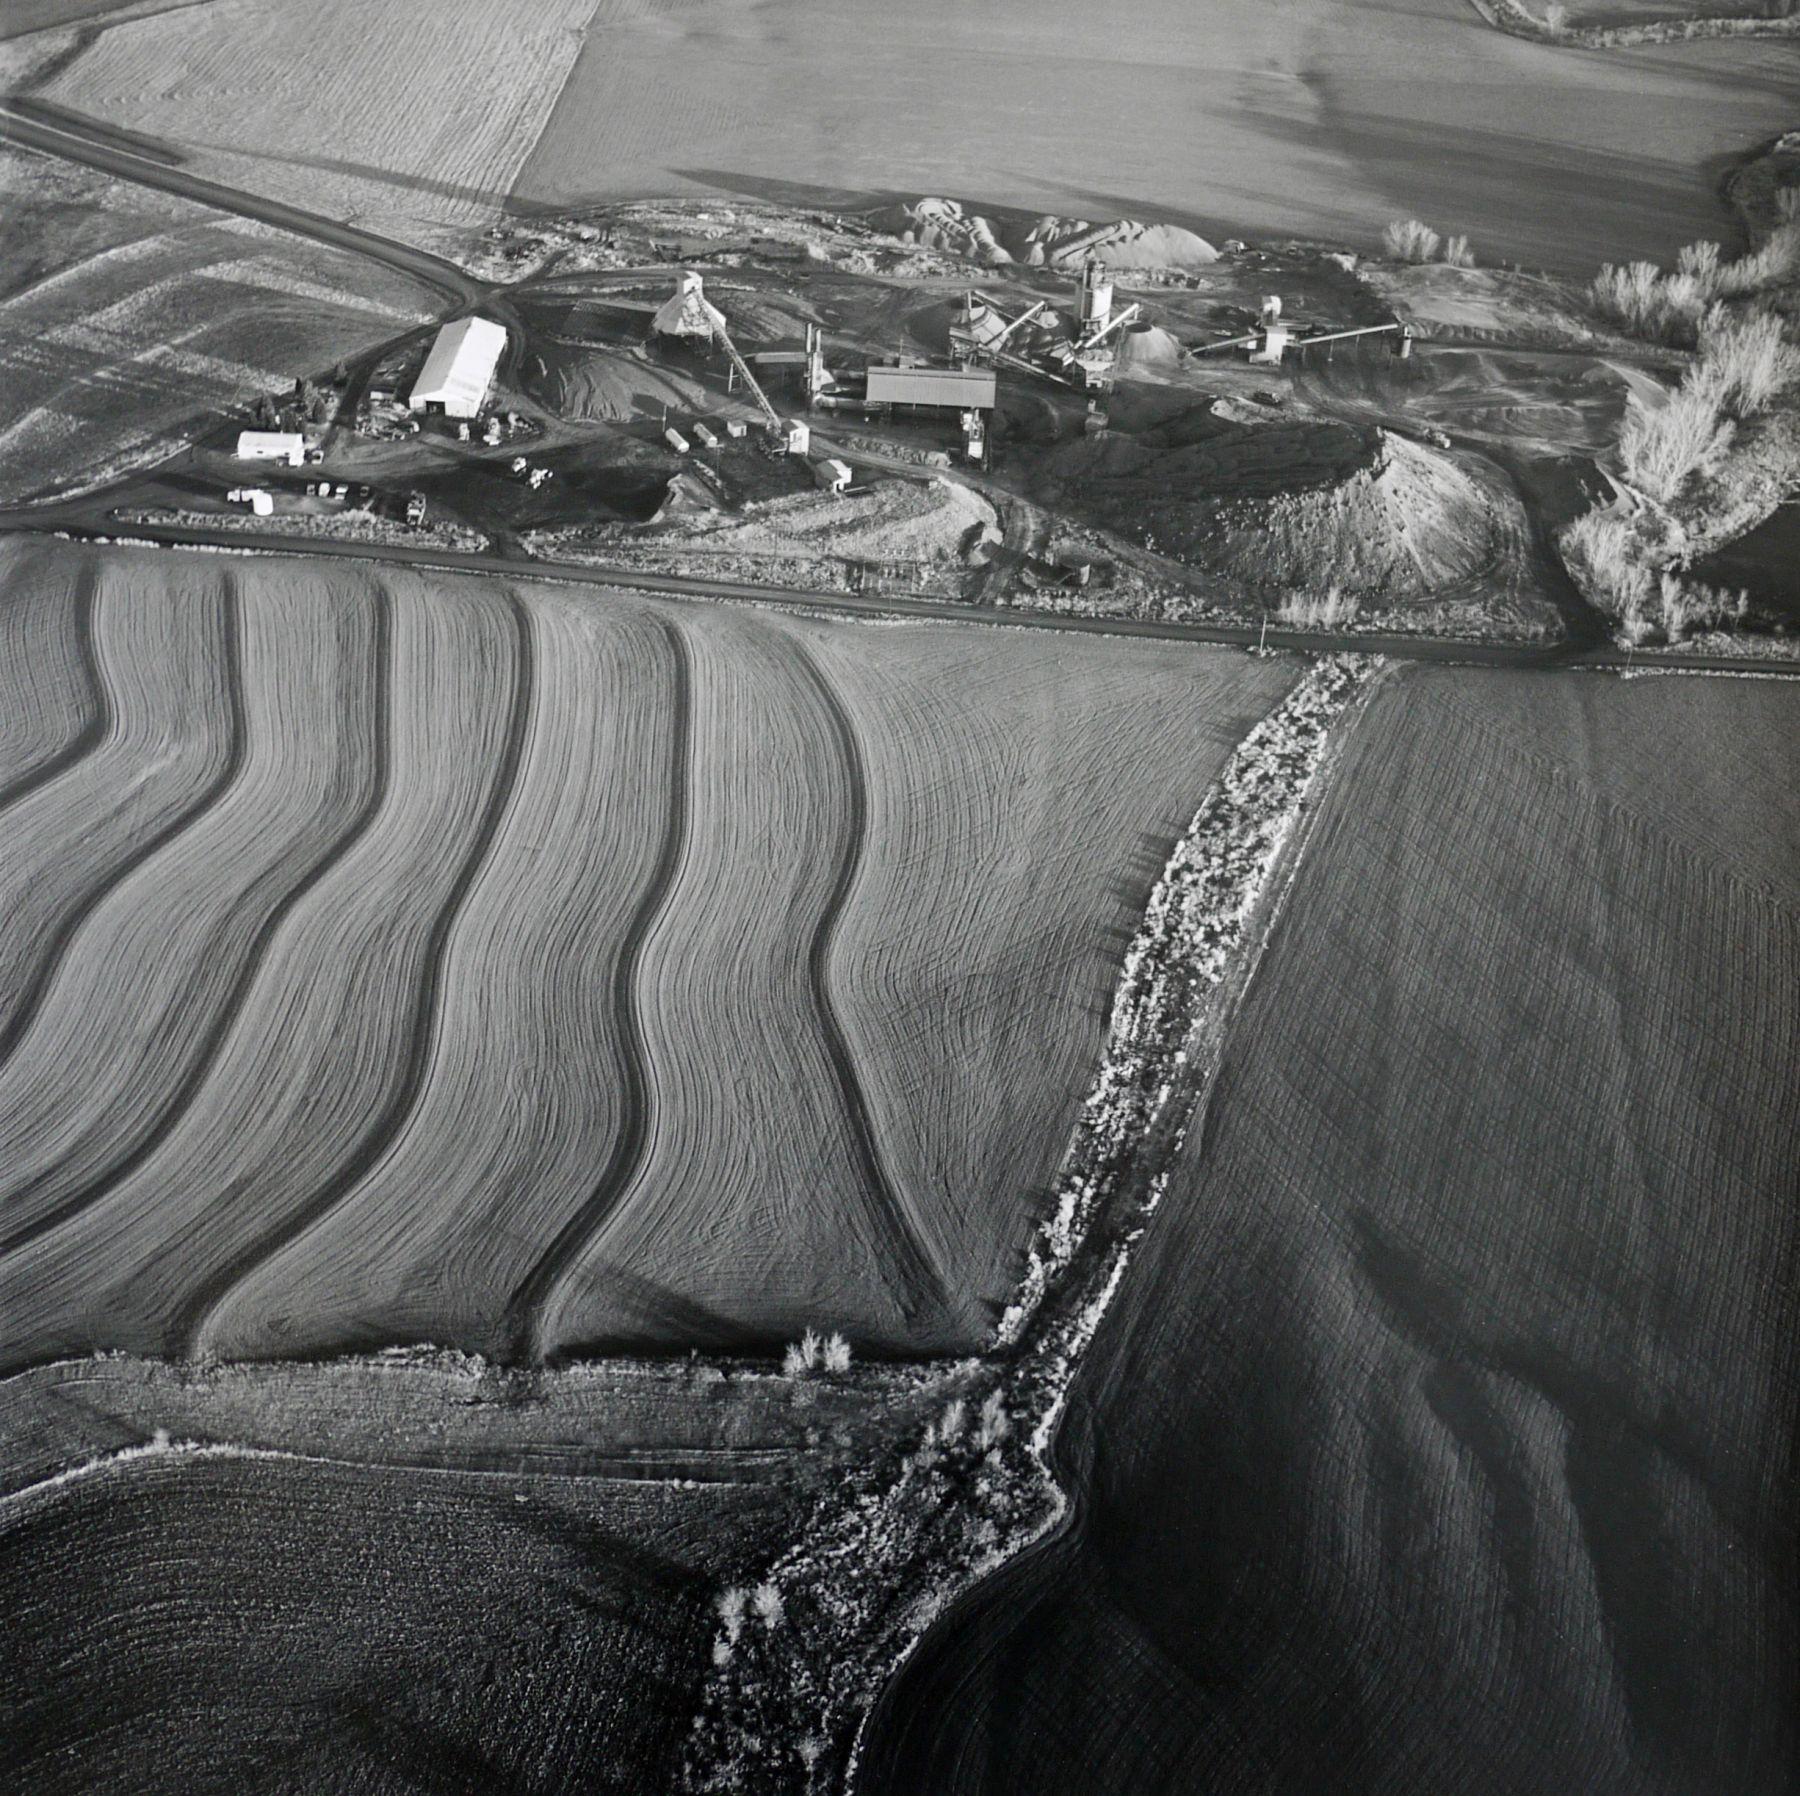 Field and Asphalt Pit, Saline County, February 7,  1991,15 x 15 inch gelatin silver print